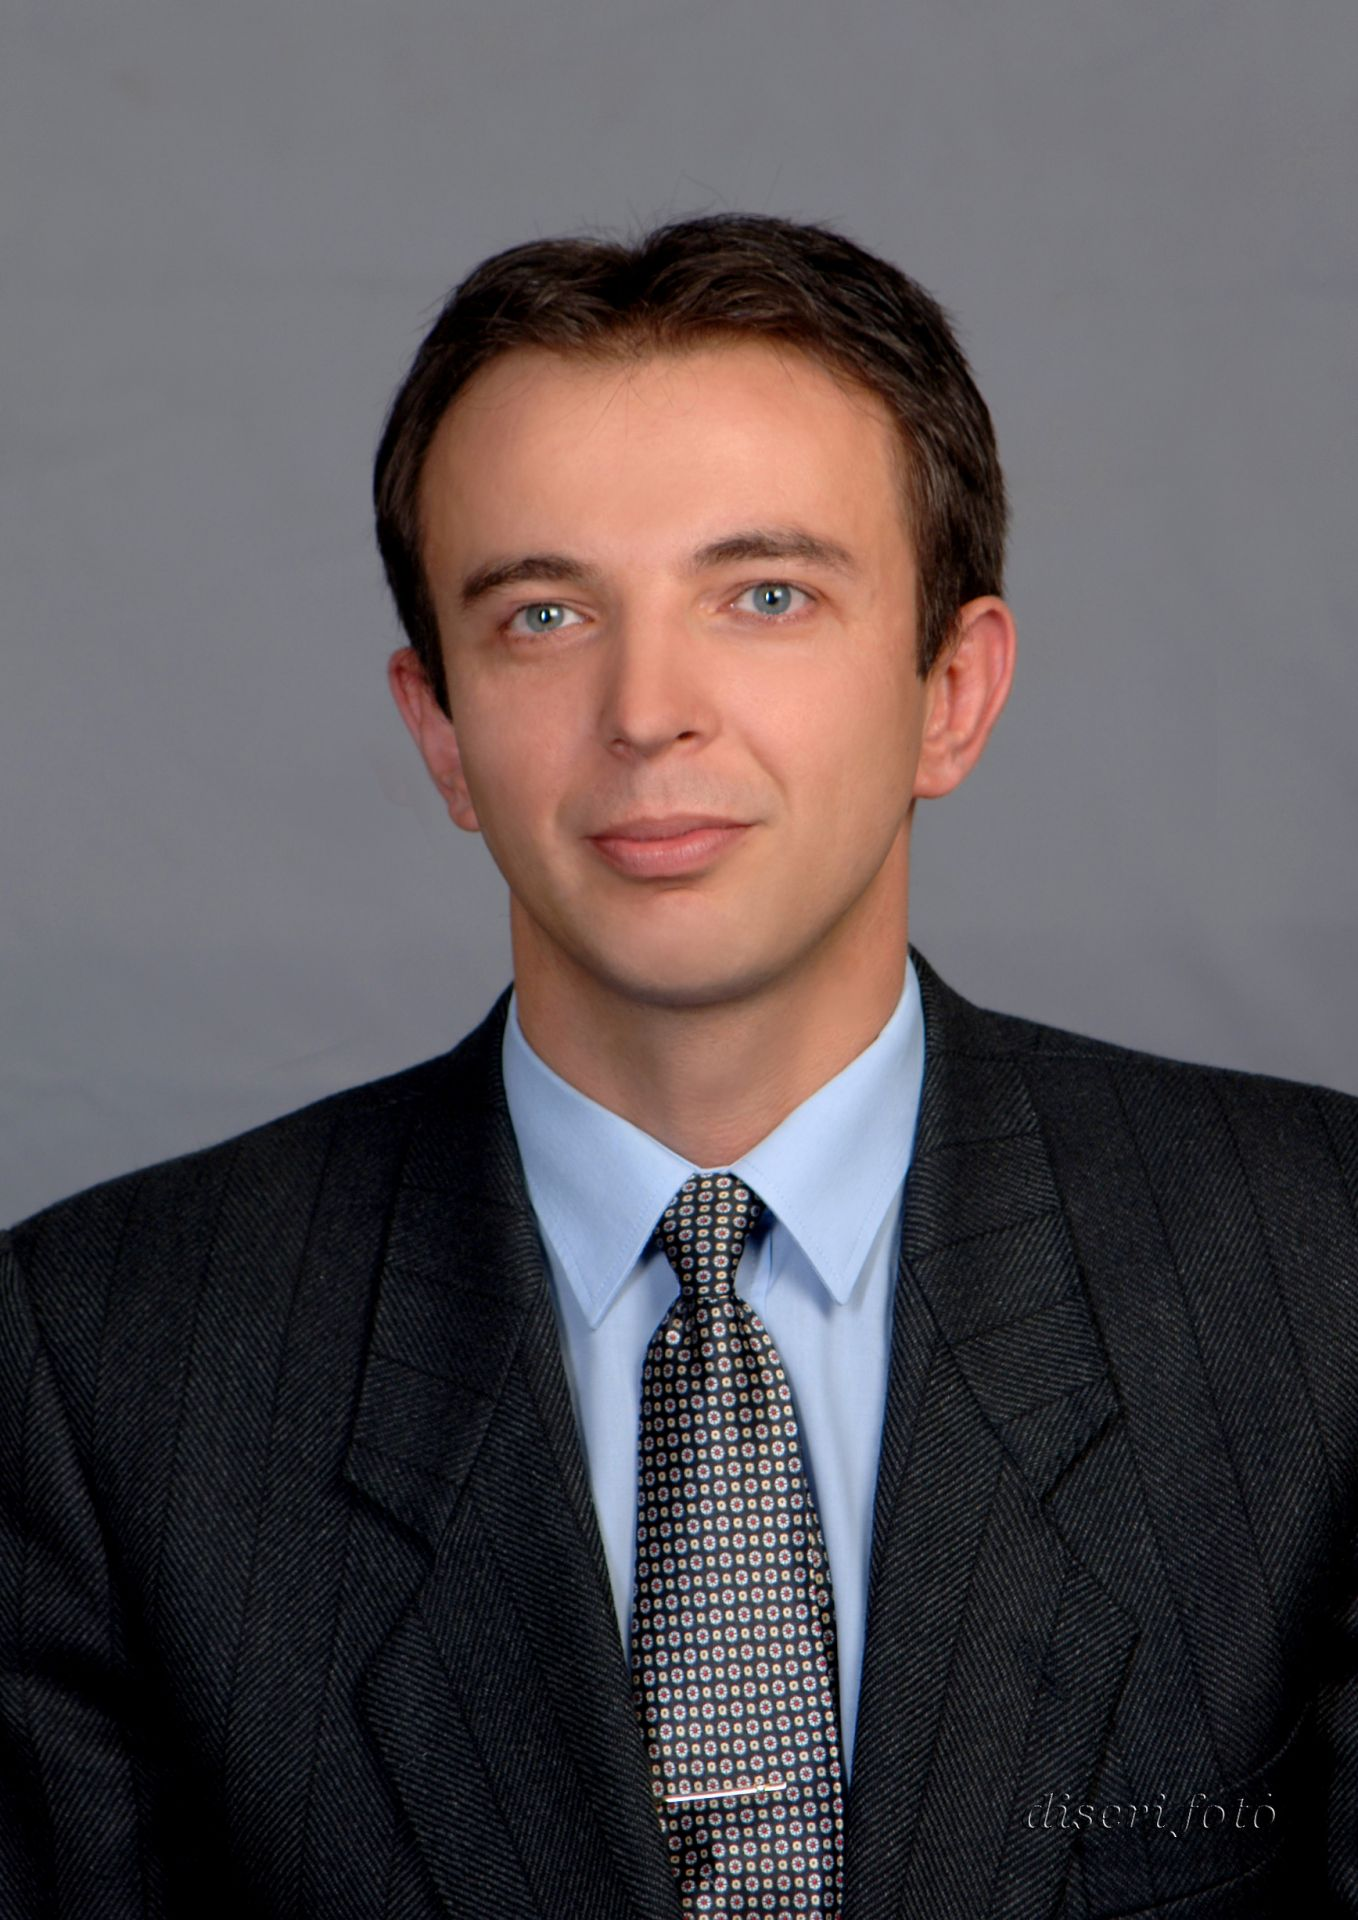 Dr. Jenei Tibor